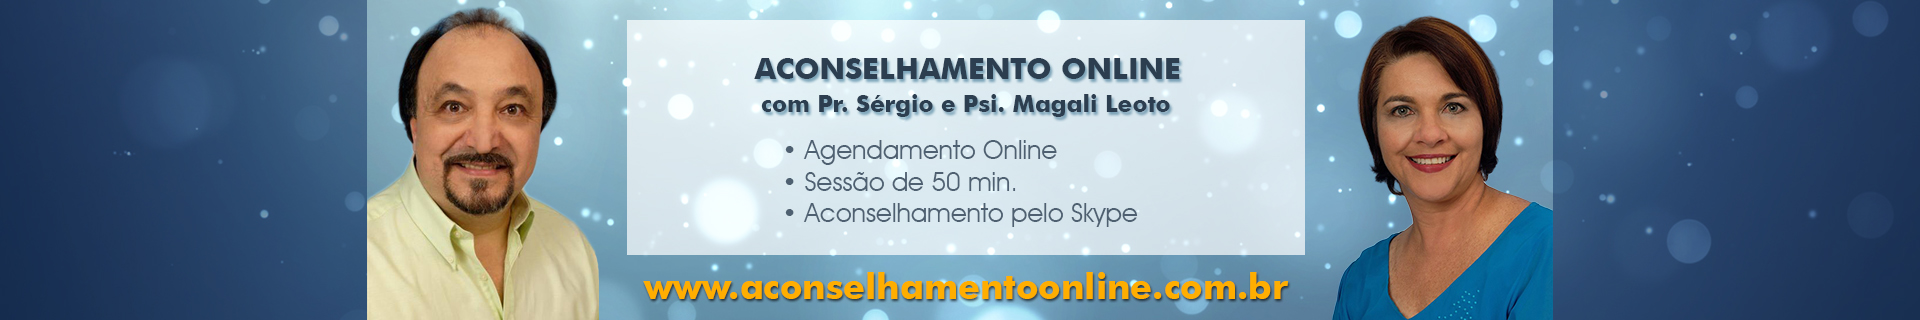 aconselhamento_sergioemagali_3